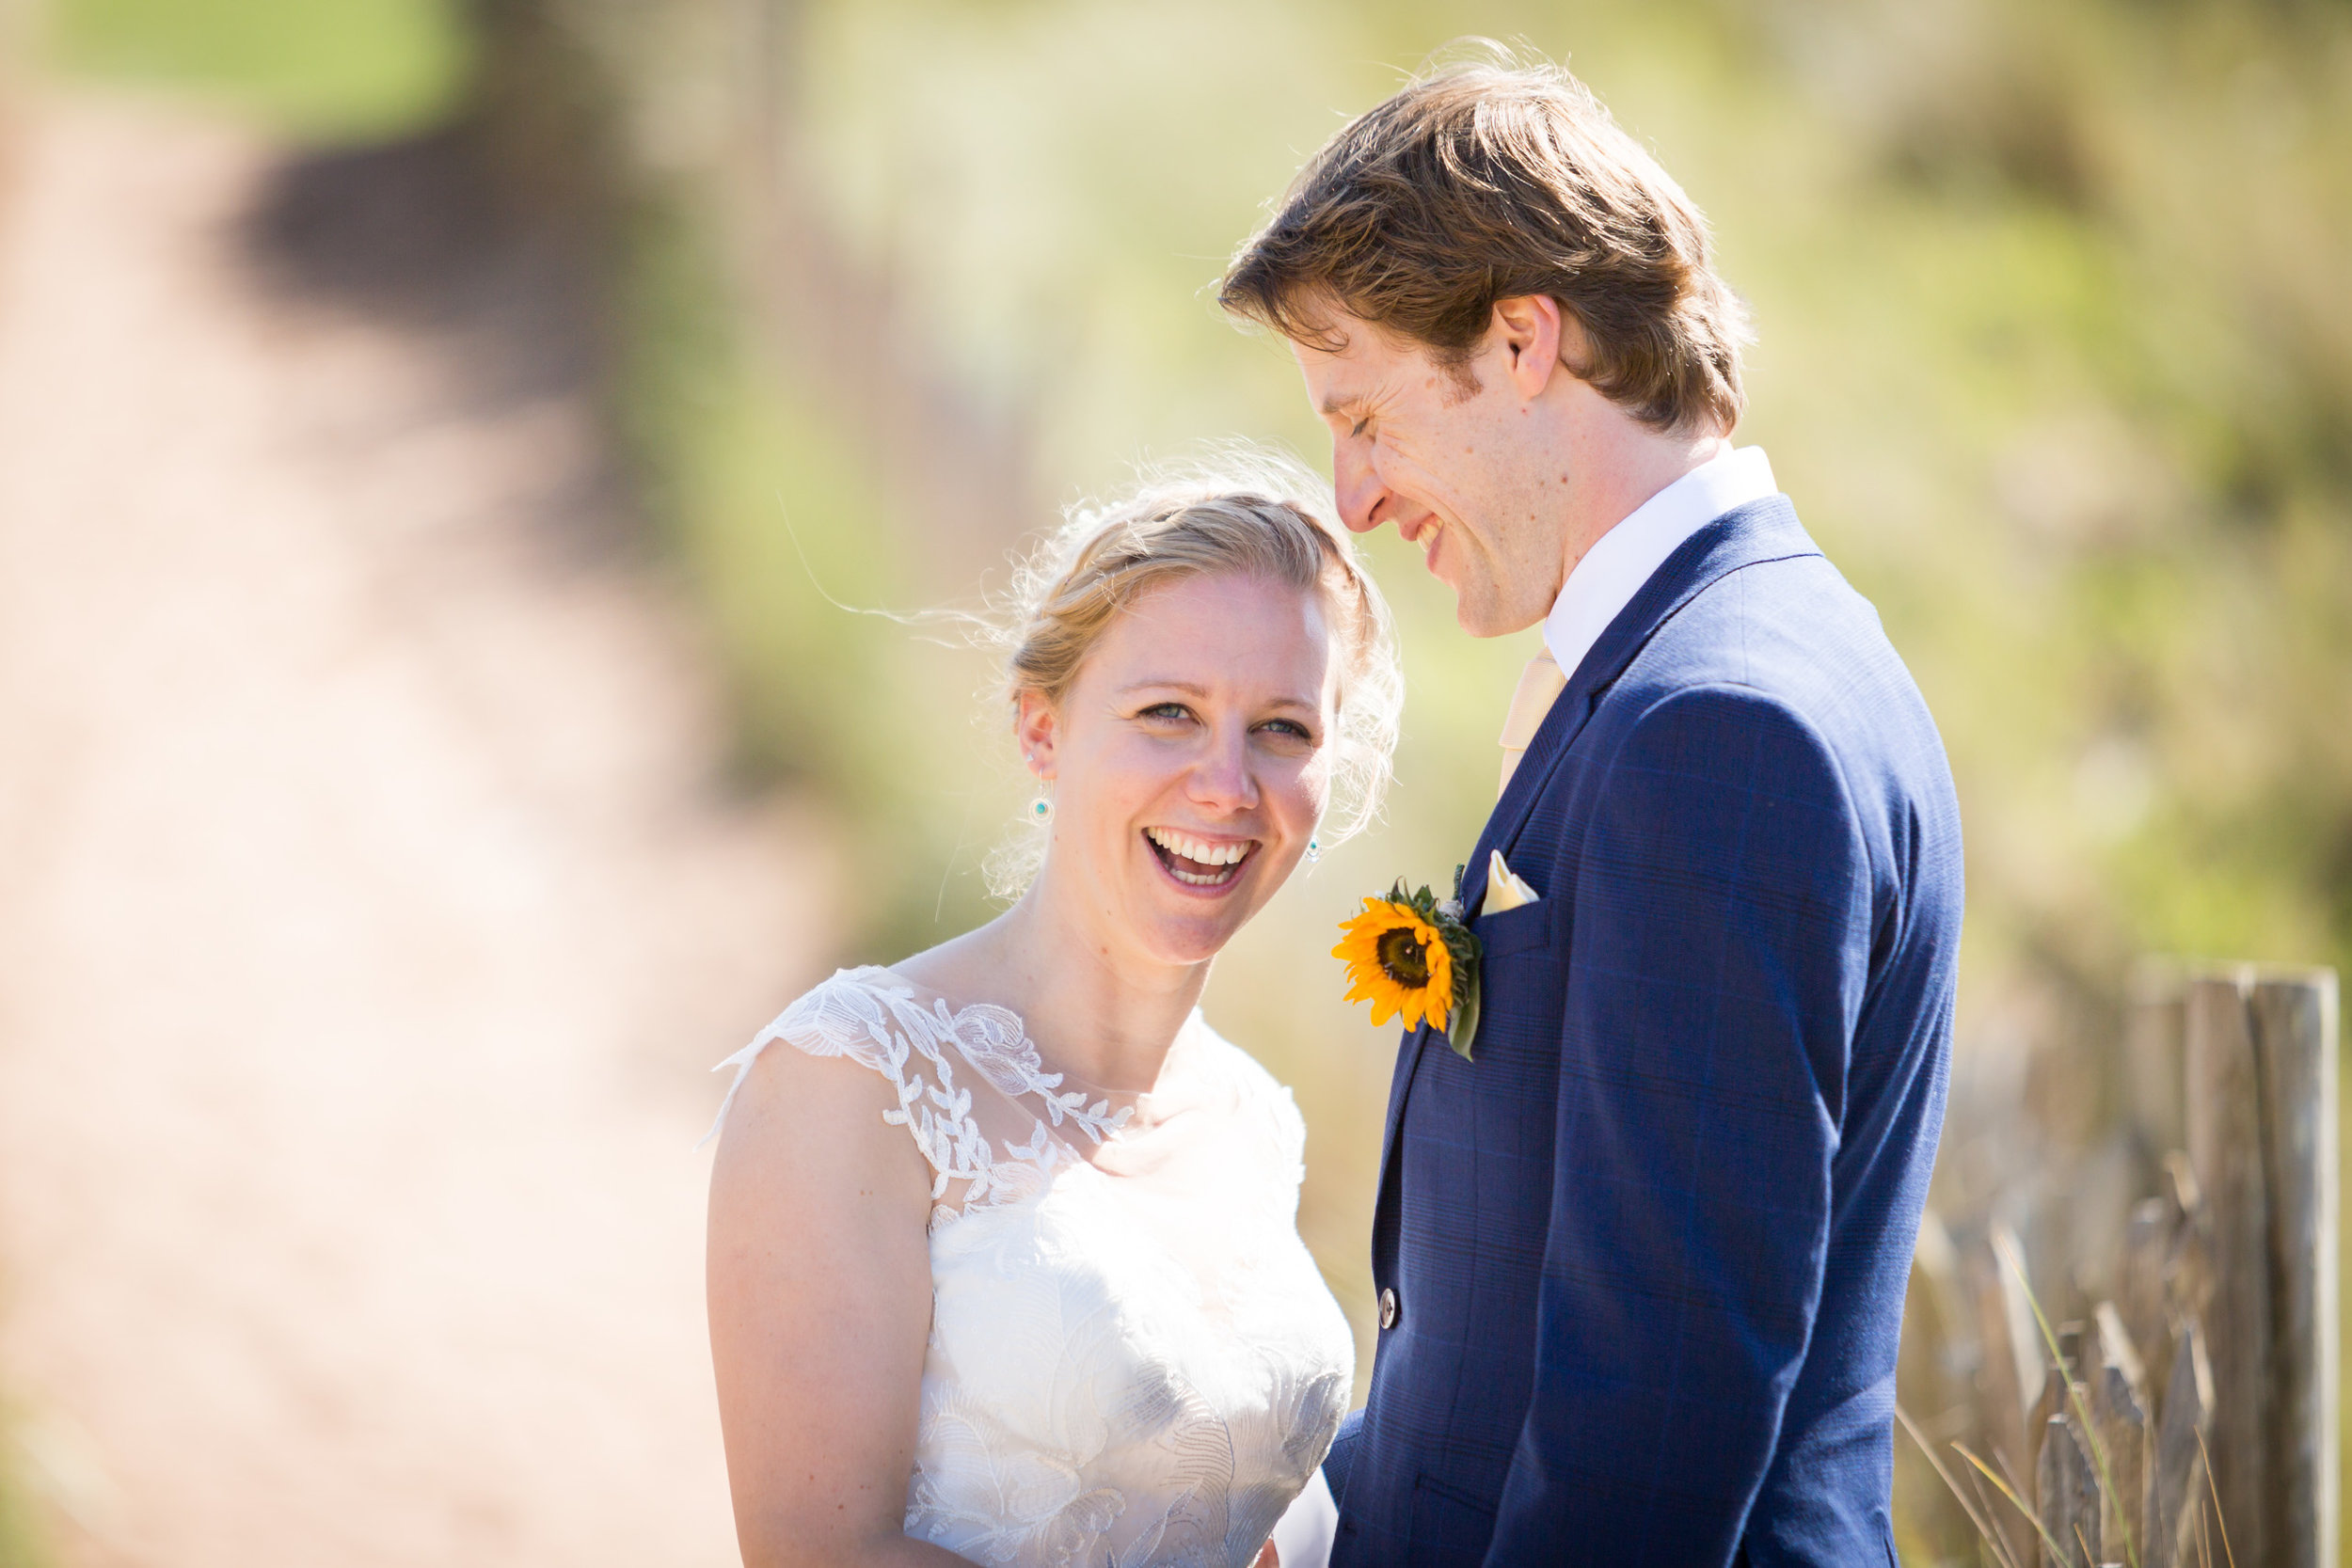 Bucklands-Tout-Saints-Hotel-Devon-Wedding-Photography-19.jpg